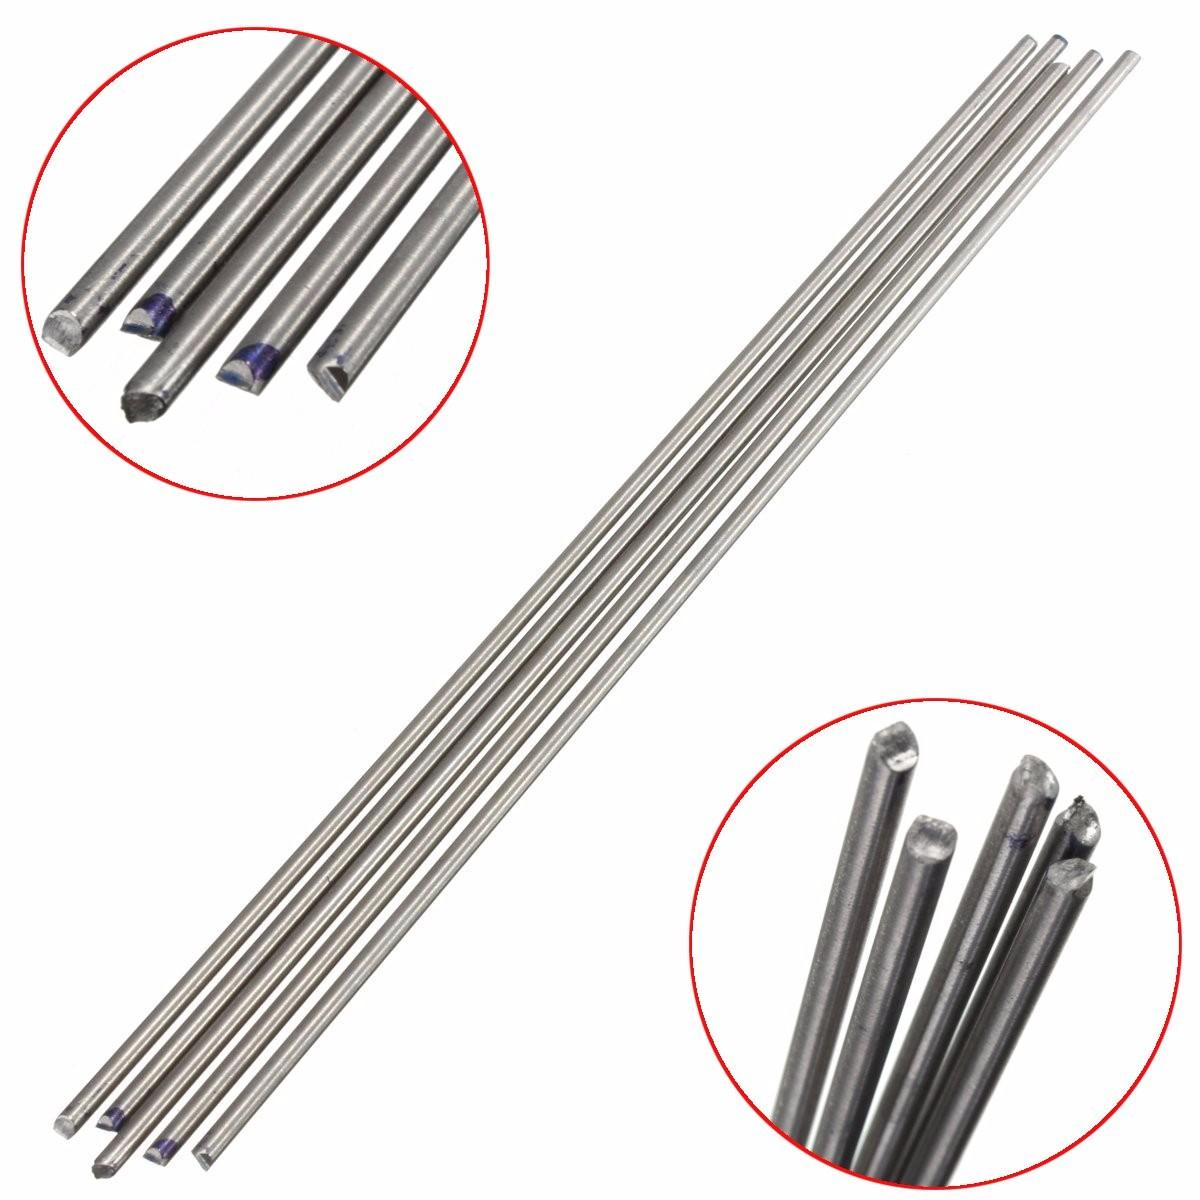 5pcs Titanium Alloy Bar 3mm x 250mm Titanium Rod Metal Shaft Bar Round Rod